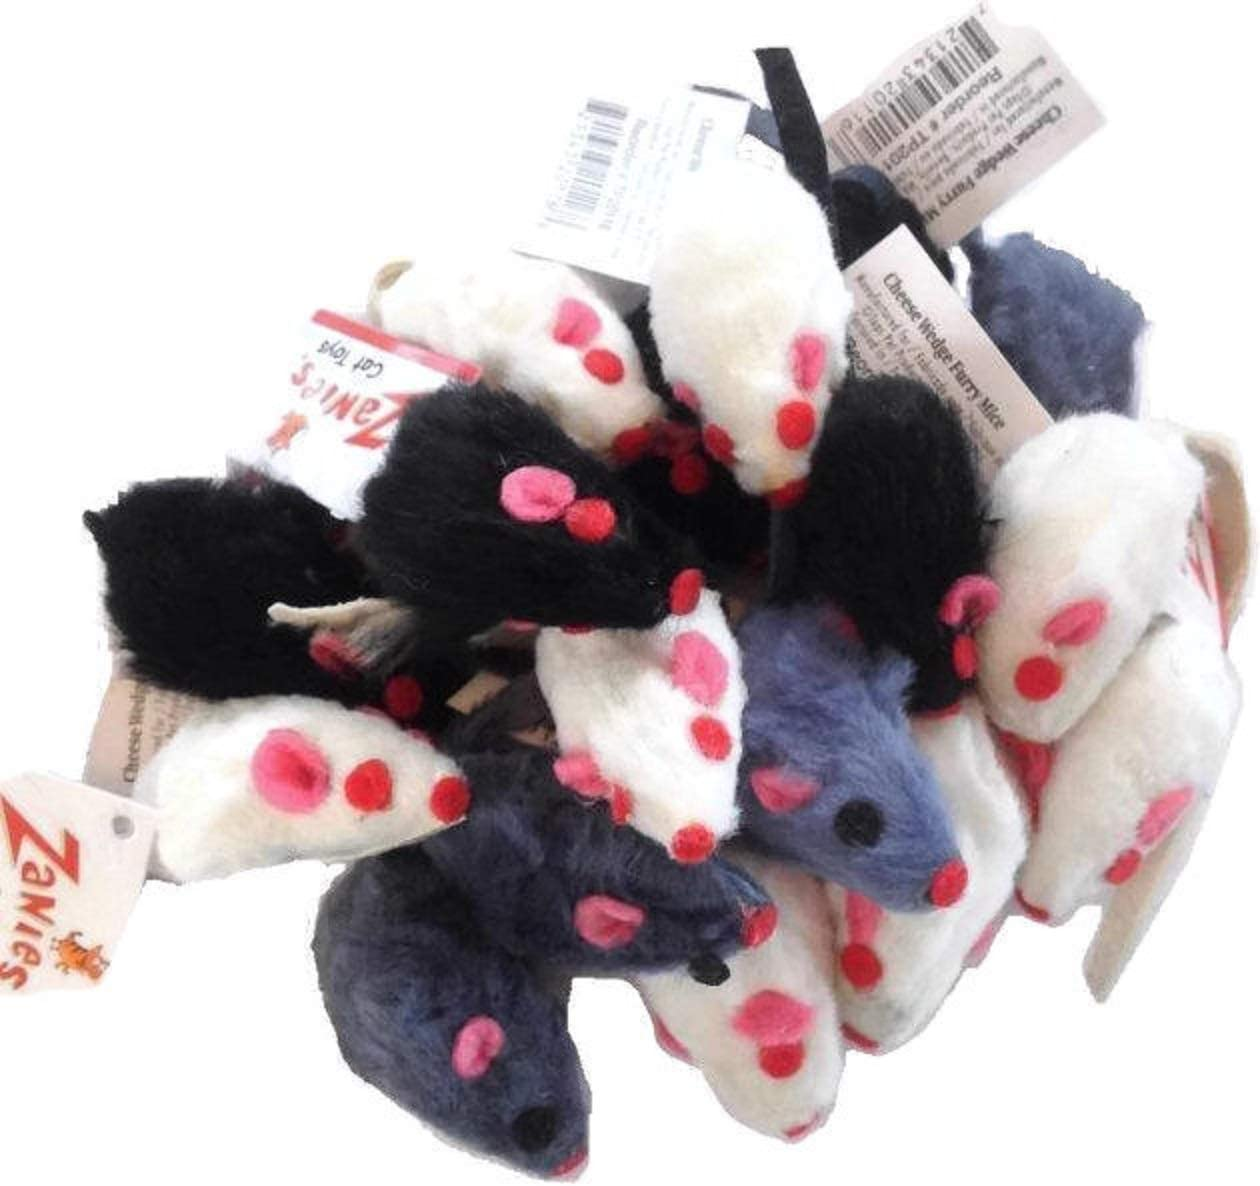 Topics Ranking TOP20 on TV 10 x Cat Toy Realistic Mice Fur